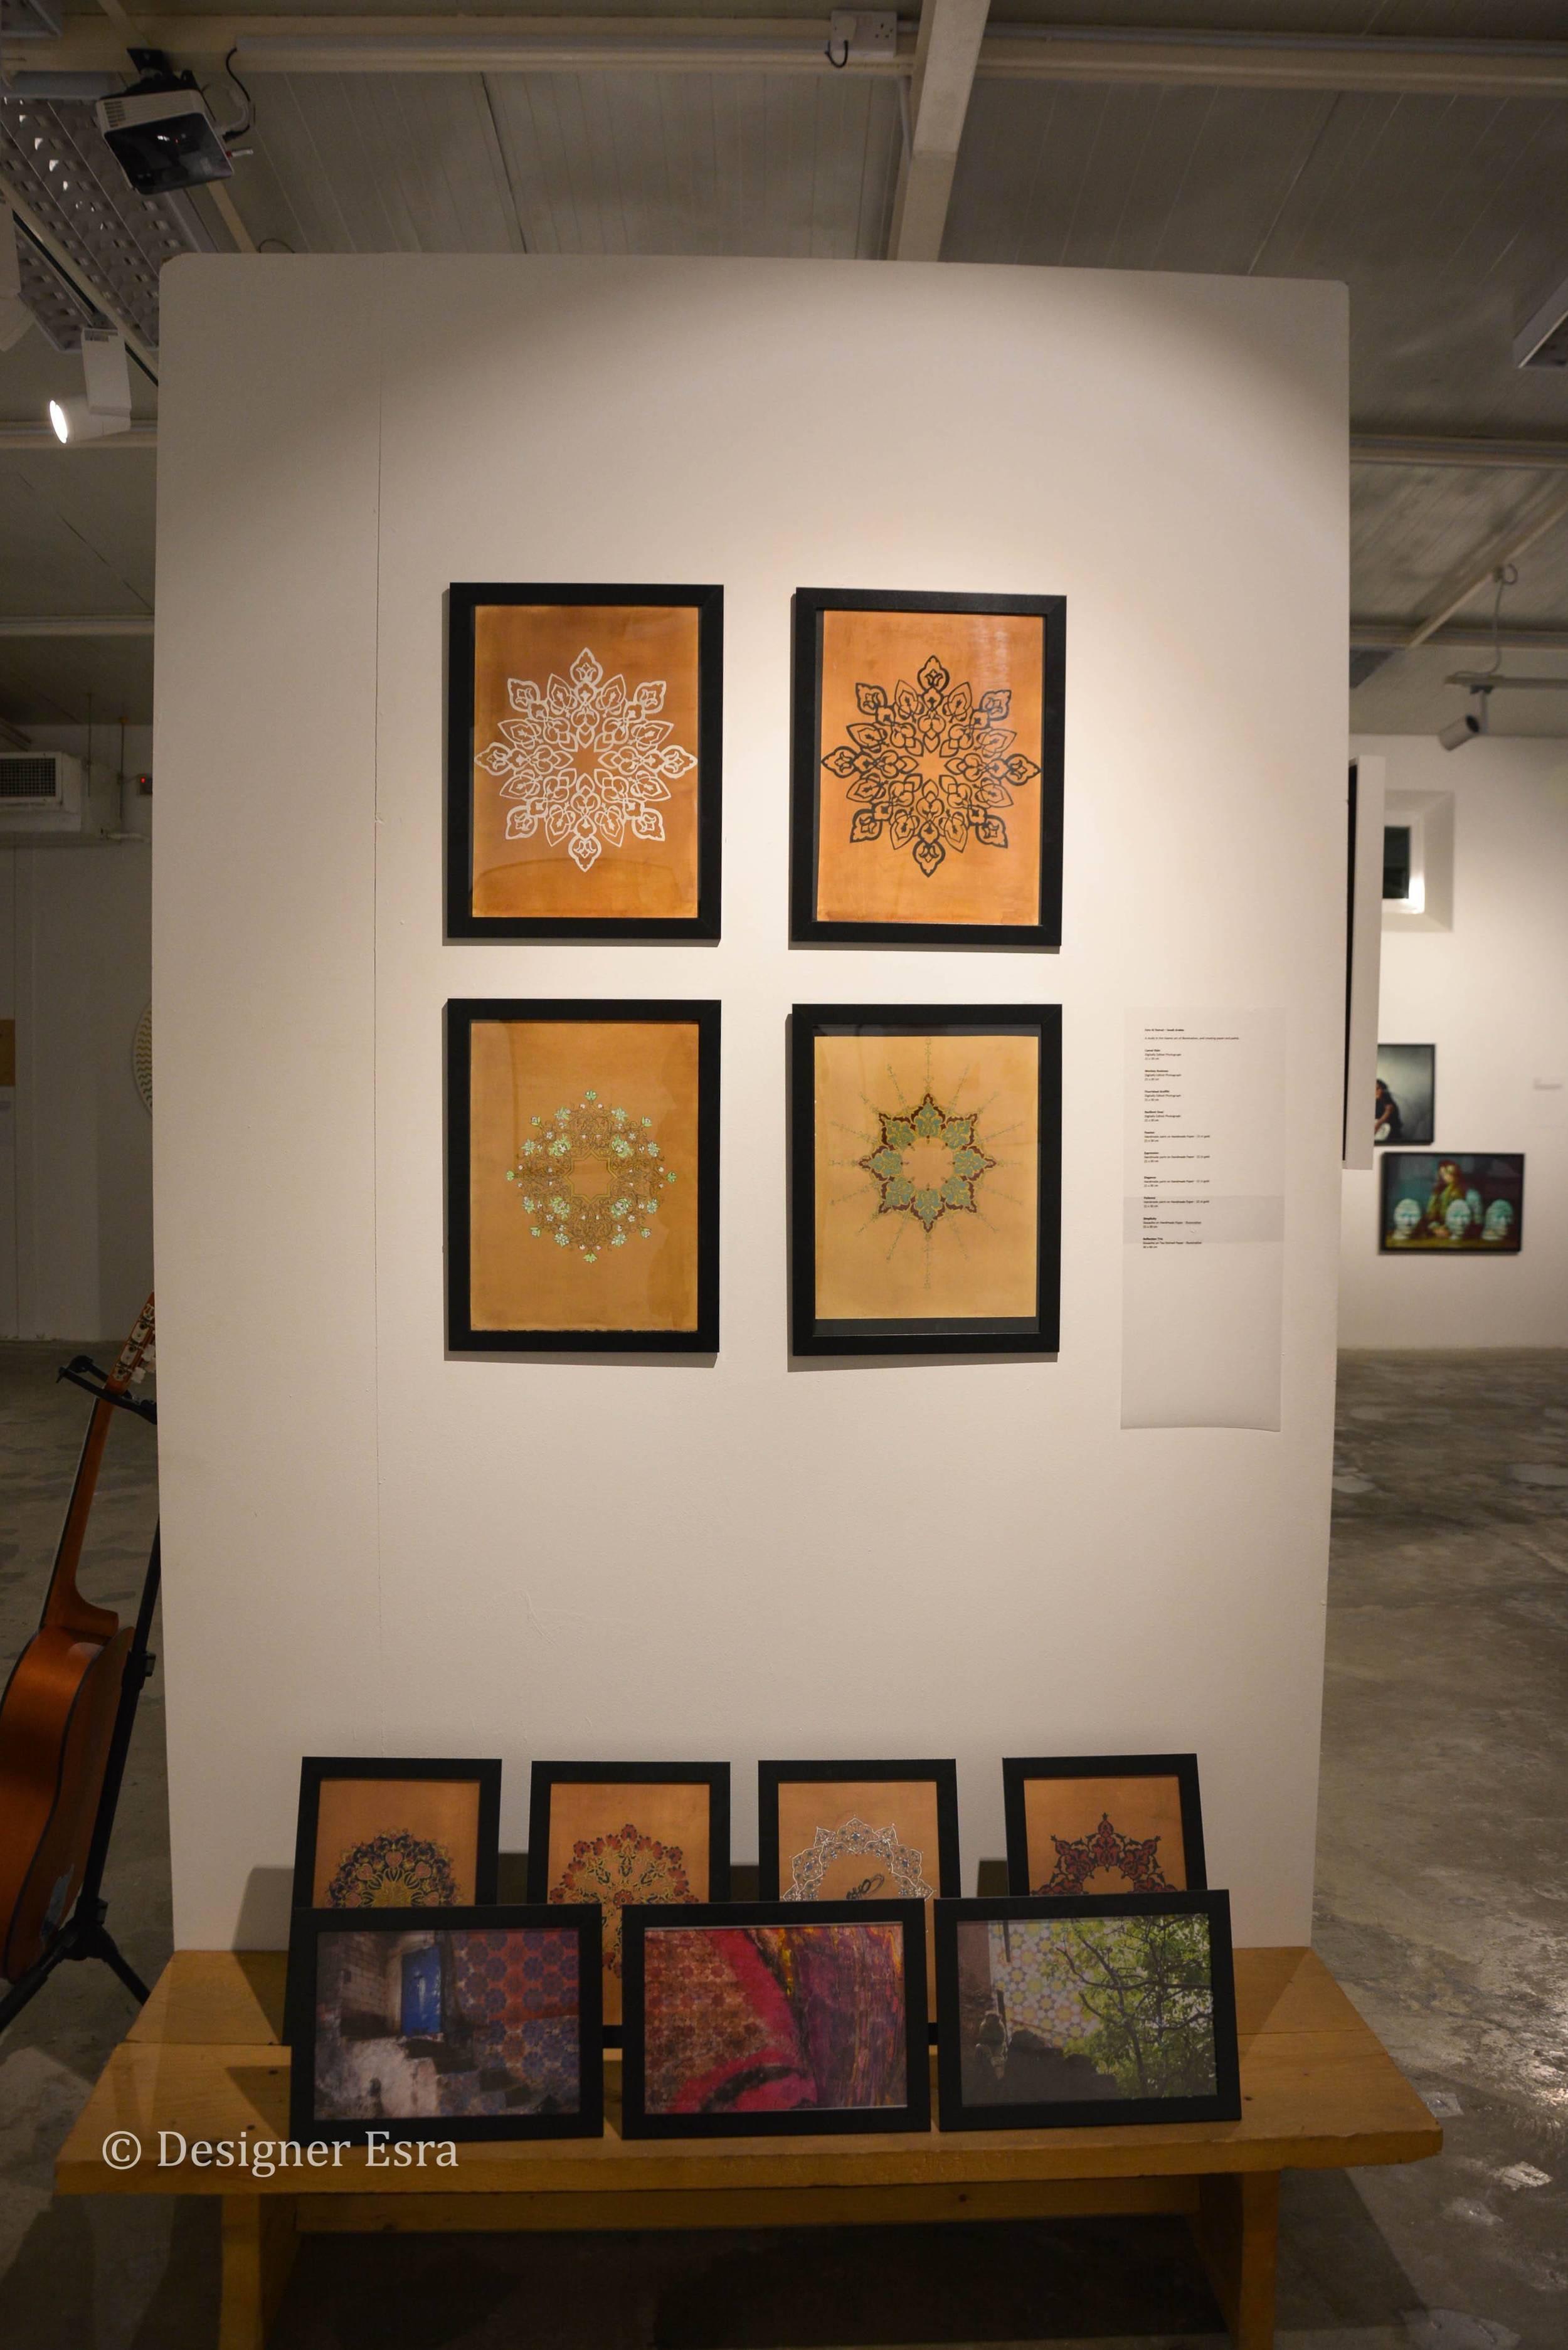 my work mashallah! :D Islamic Patterns and Illuminations by Esra Alhamal